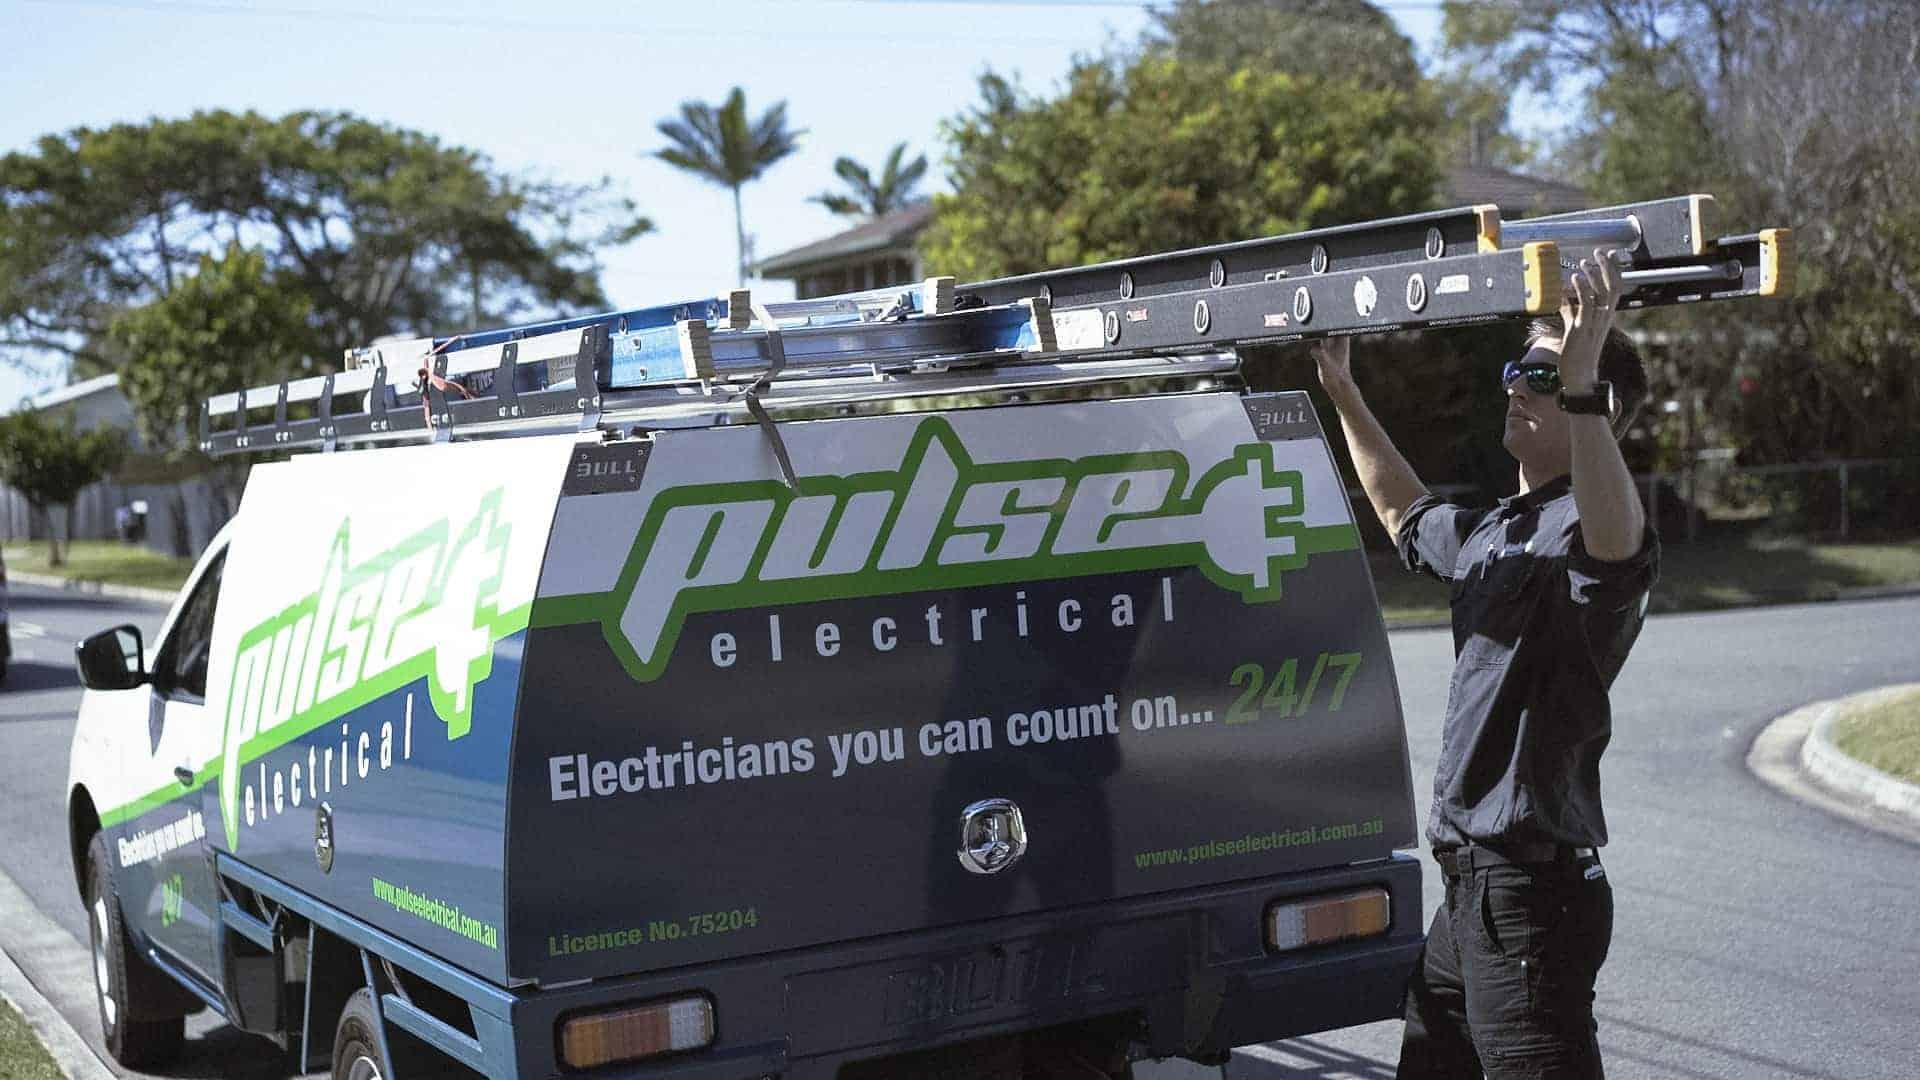 toowoomba electrician